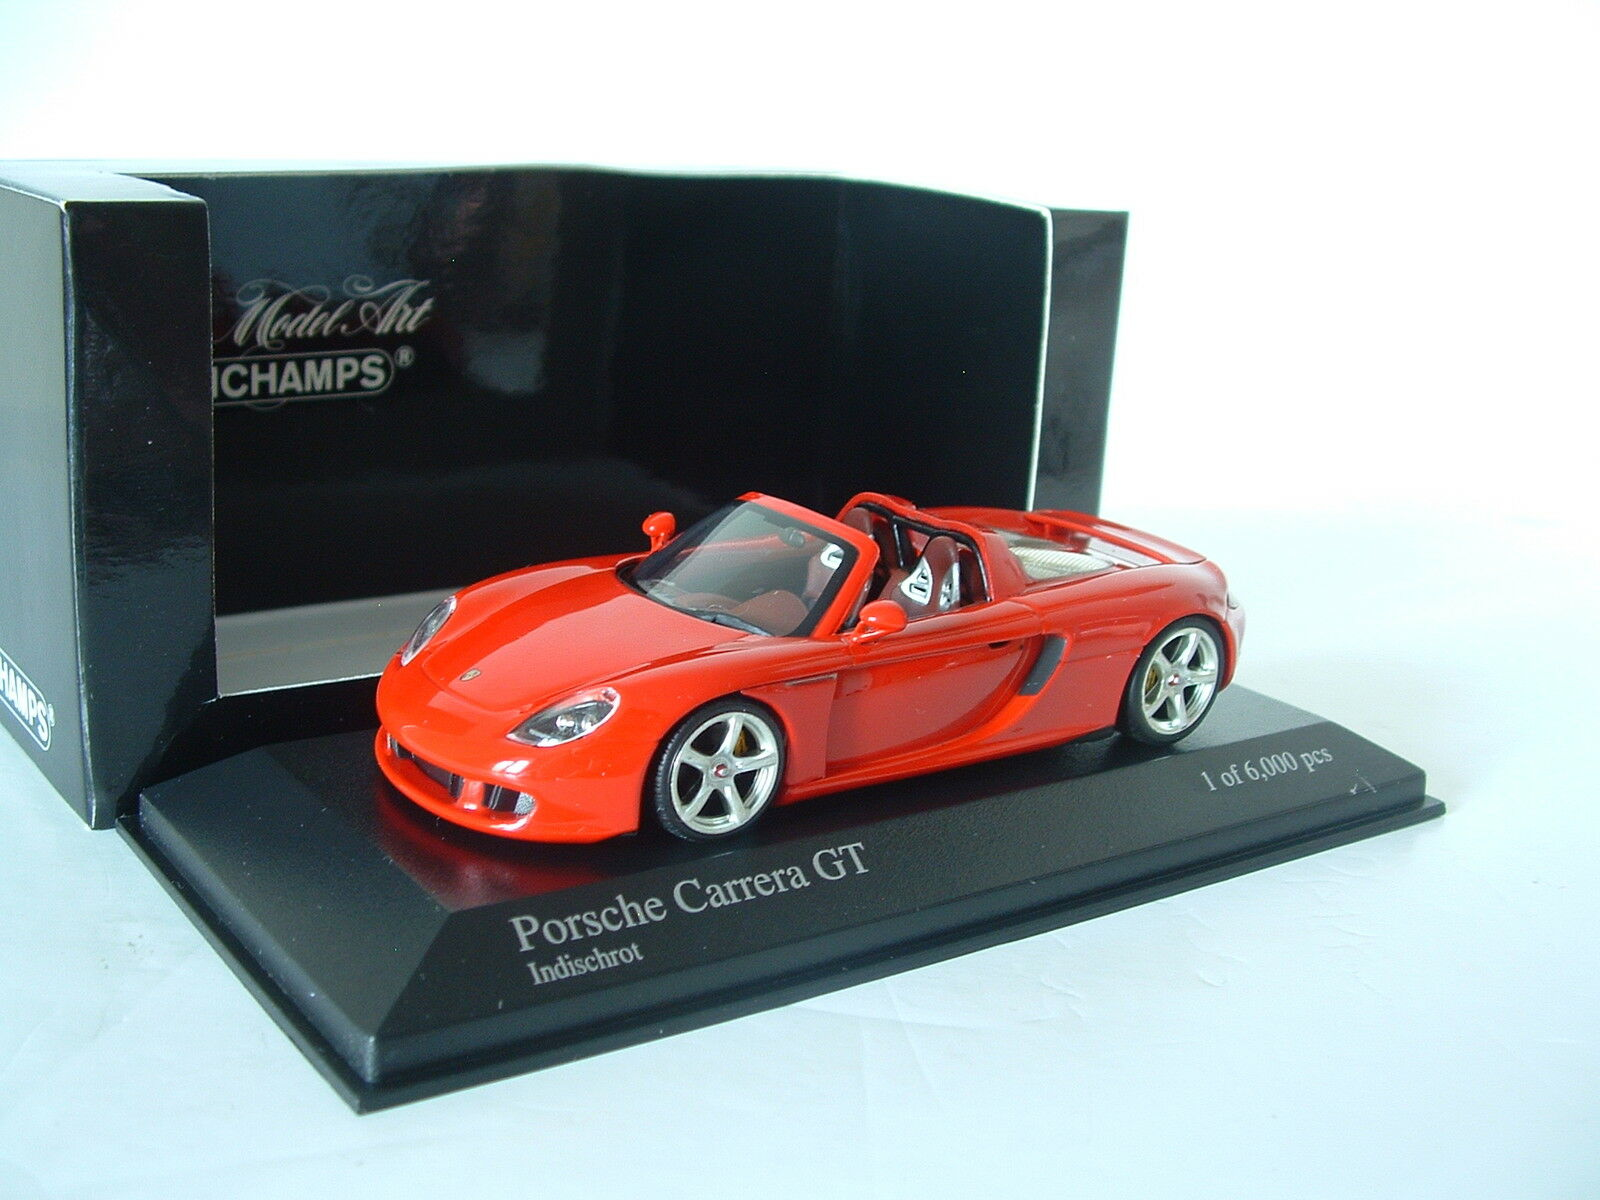 Minichamps 1 43 Porsche Carrera GT 2003 Indischred Red 400 062632